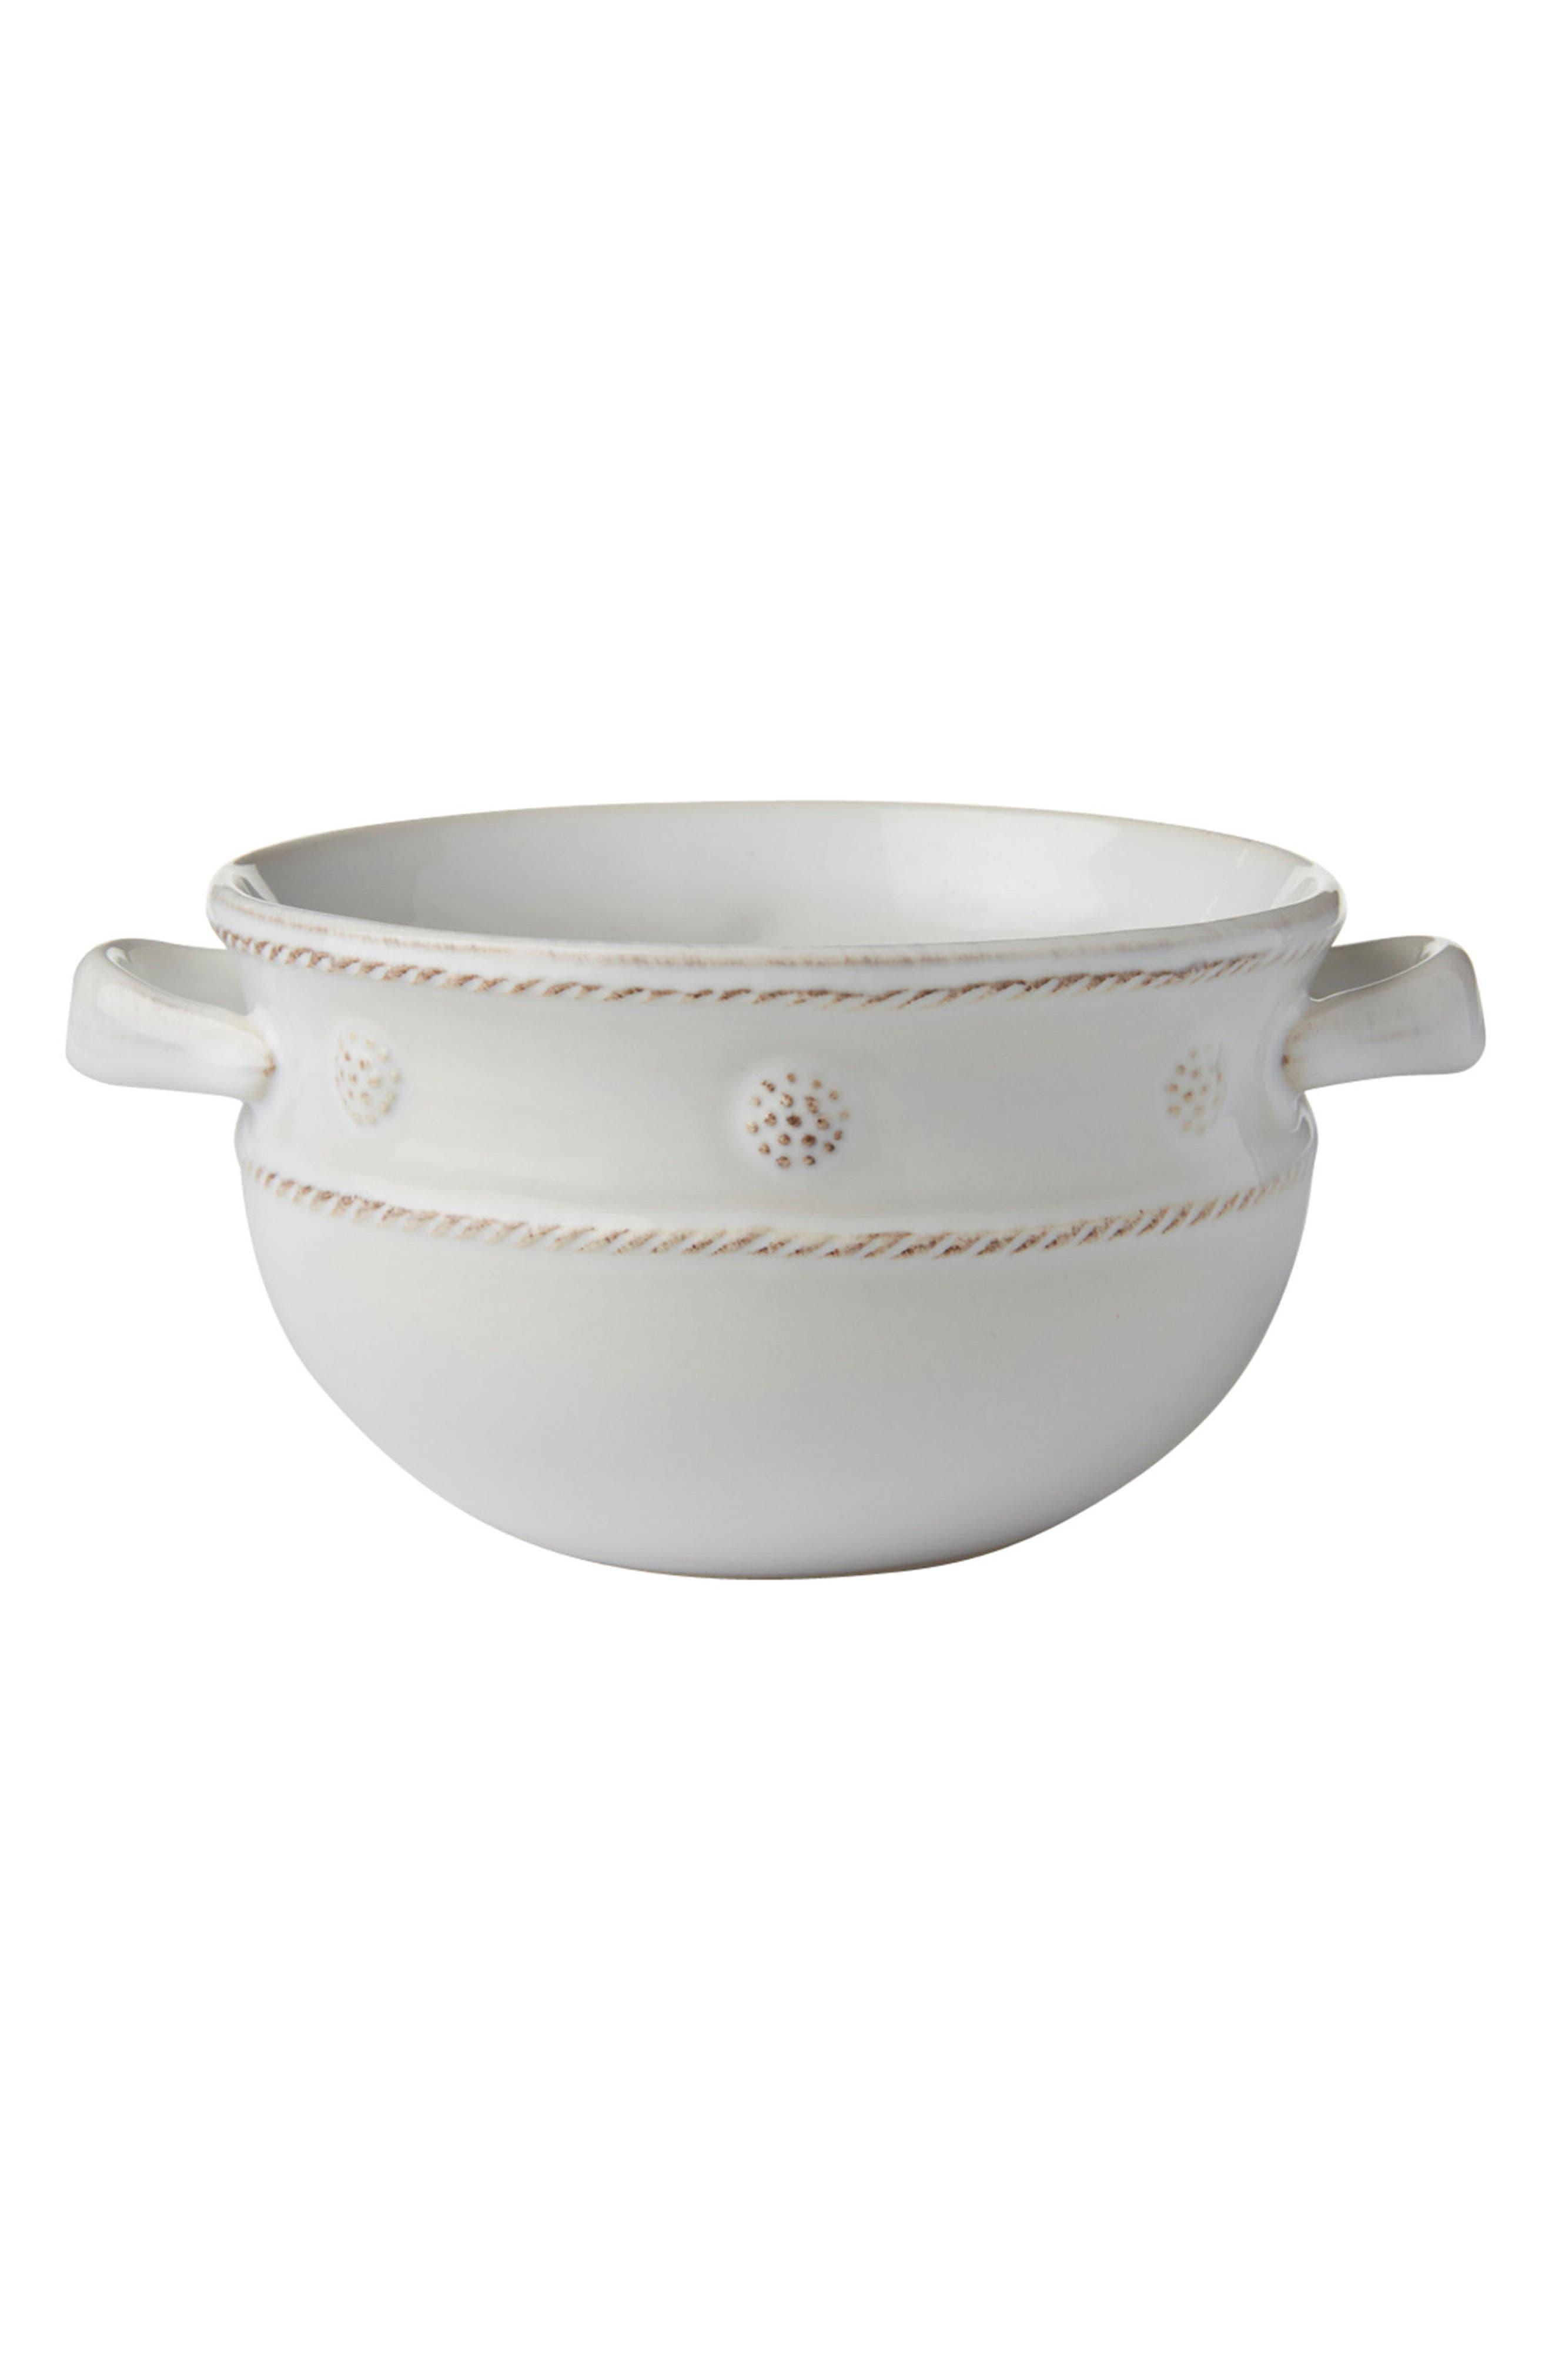 Juliska Berry & Thread Two-Handle Ceramic Bowl